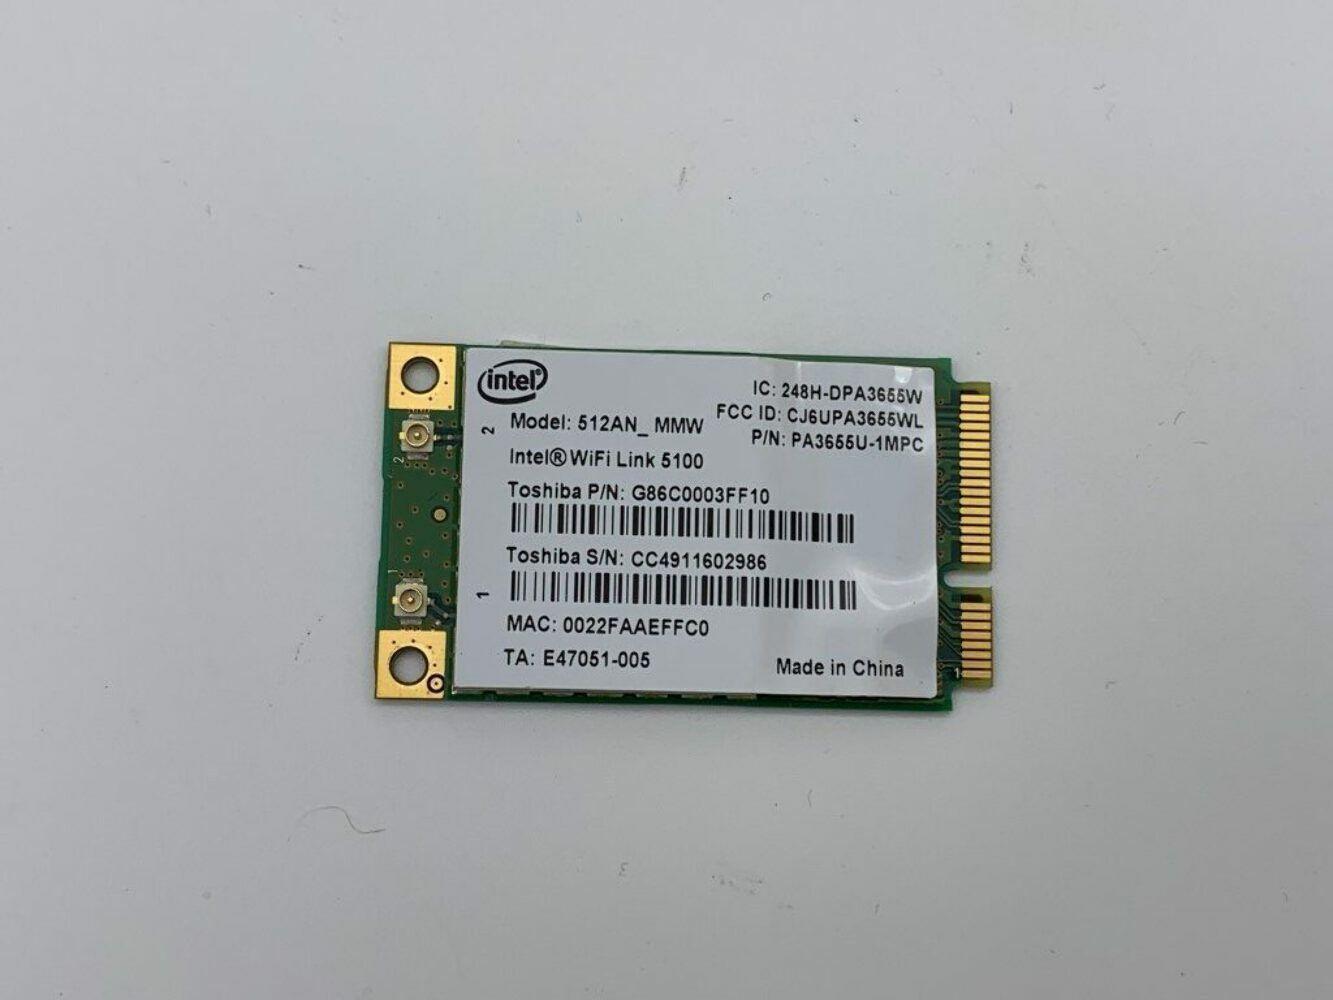 Toshiba Satellite A300 512AM_MMW WiFi Card - AU Seller - Free Post